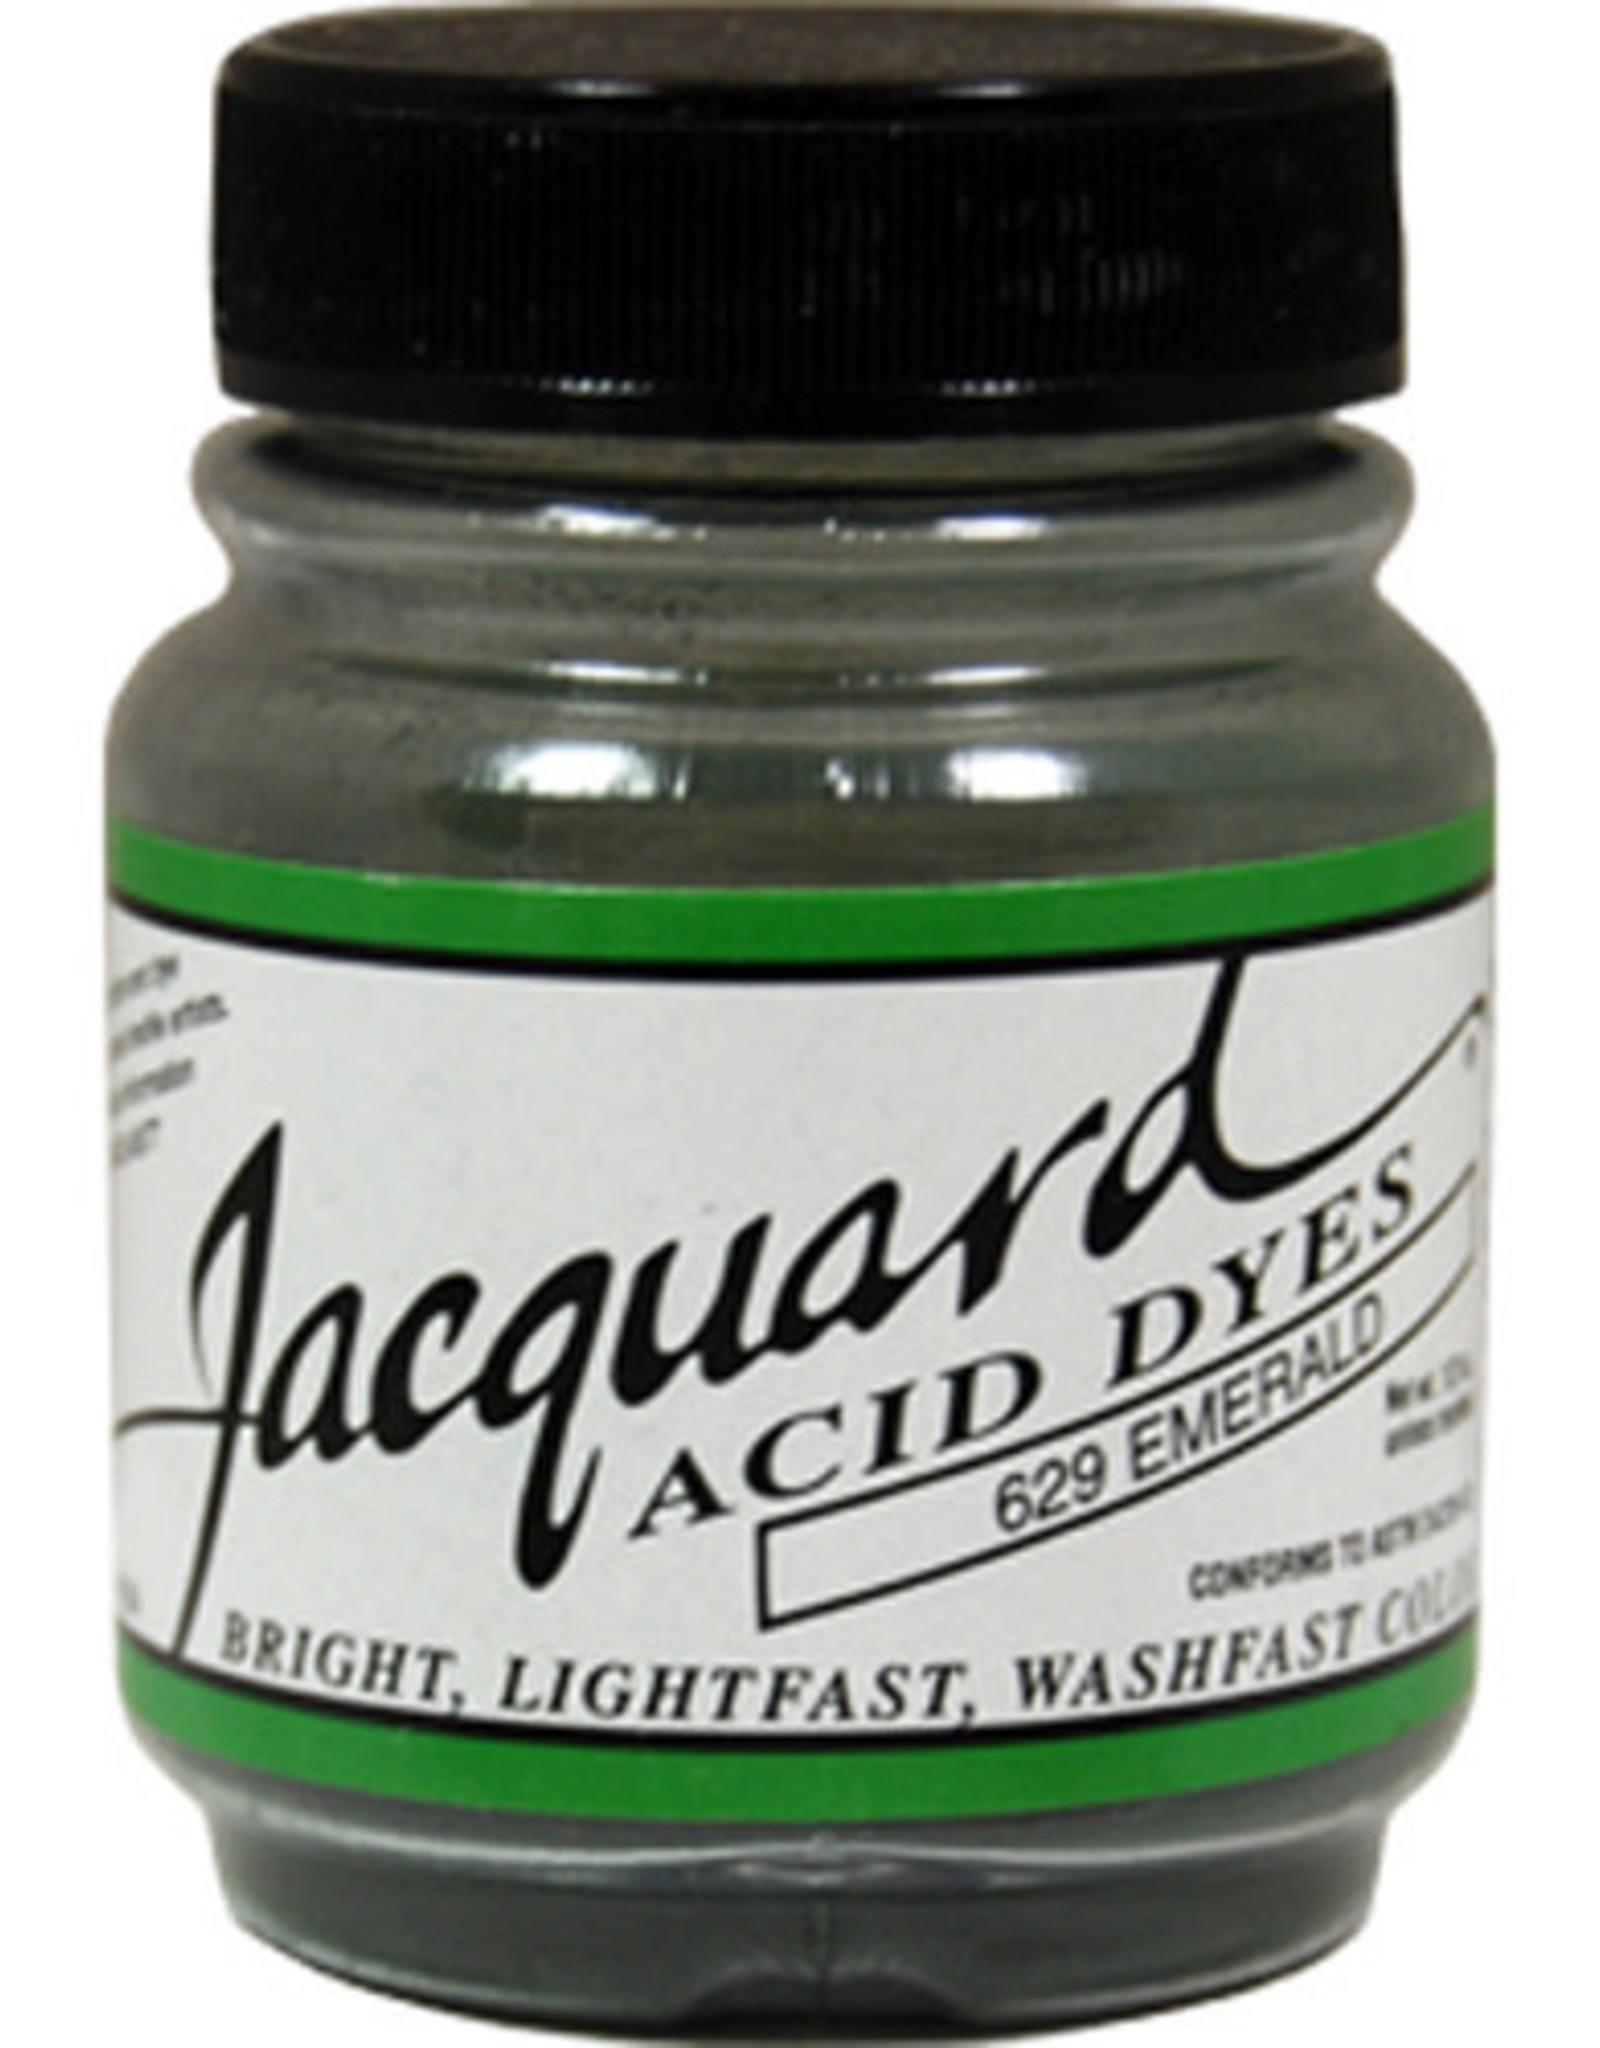 Jacquard Jacquard Acid Dye Emerald